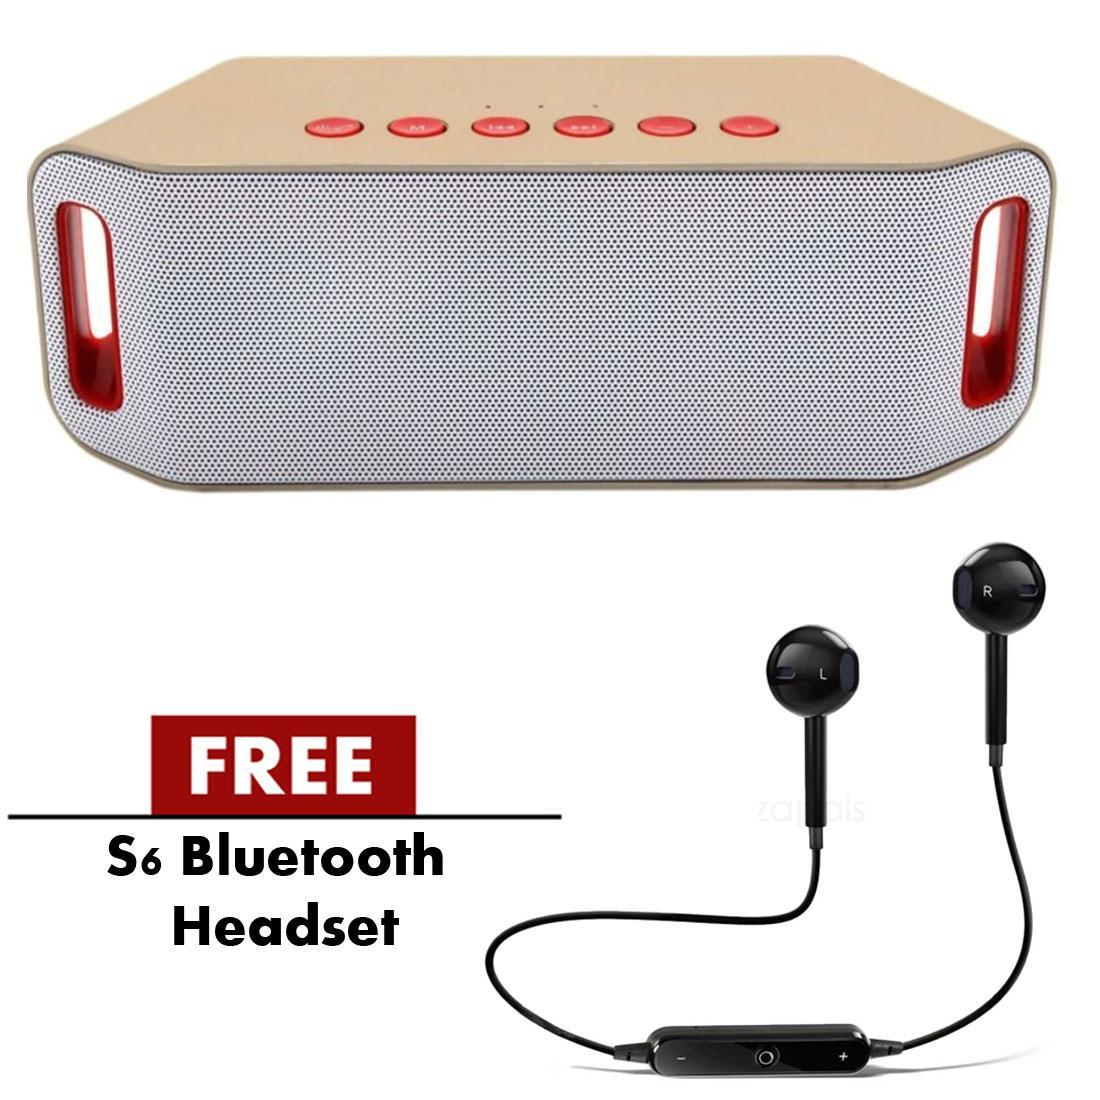 S204 SuperBass Portable Wireless Bluetooth Speaker (Gold) With Free S6 4 1  Bluetooth Sport Wireless Headset (Black)